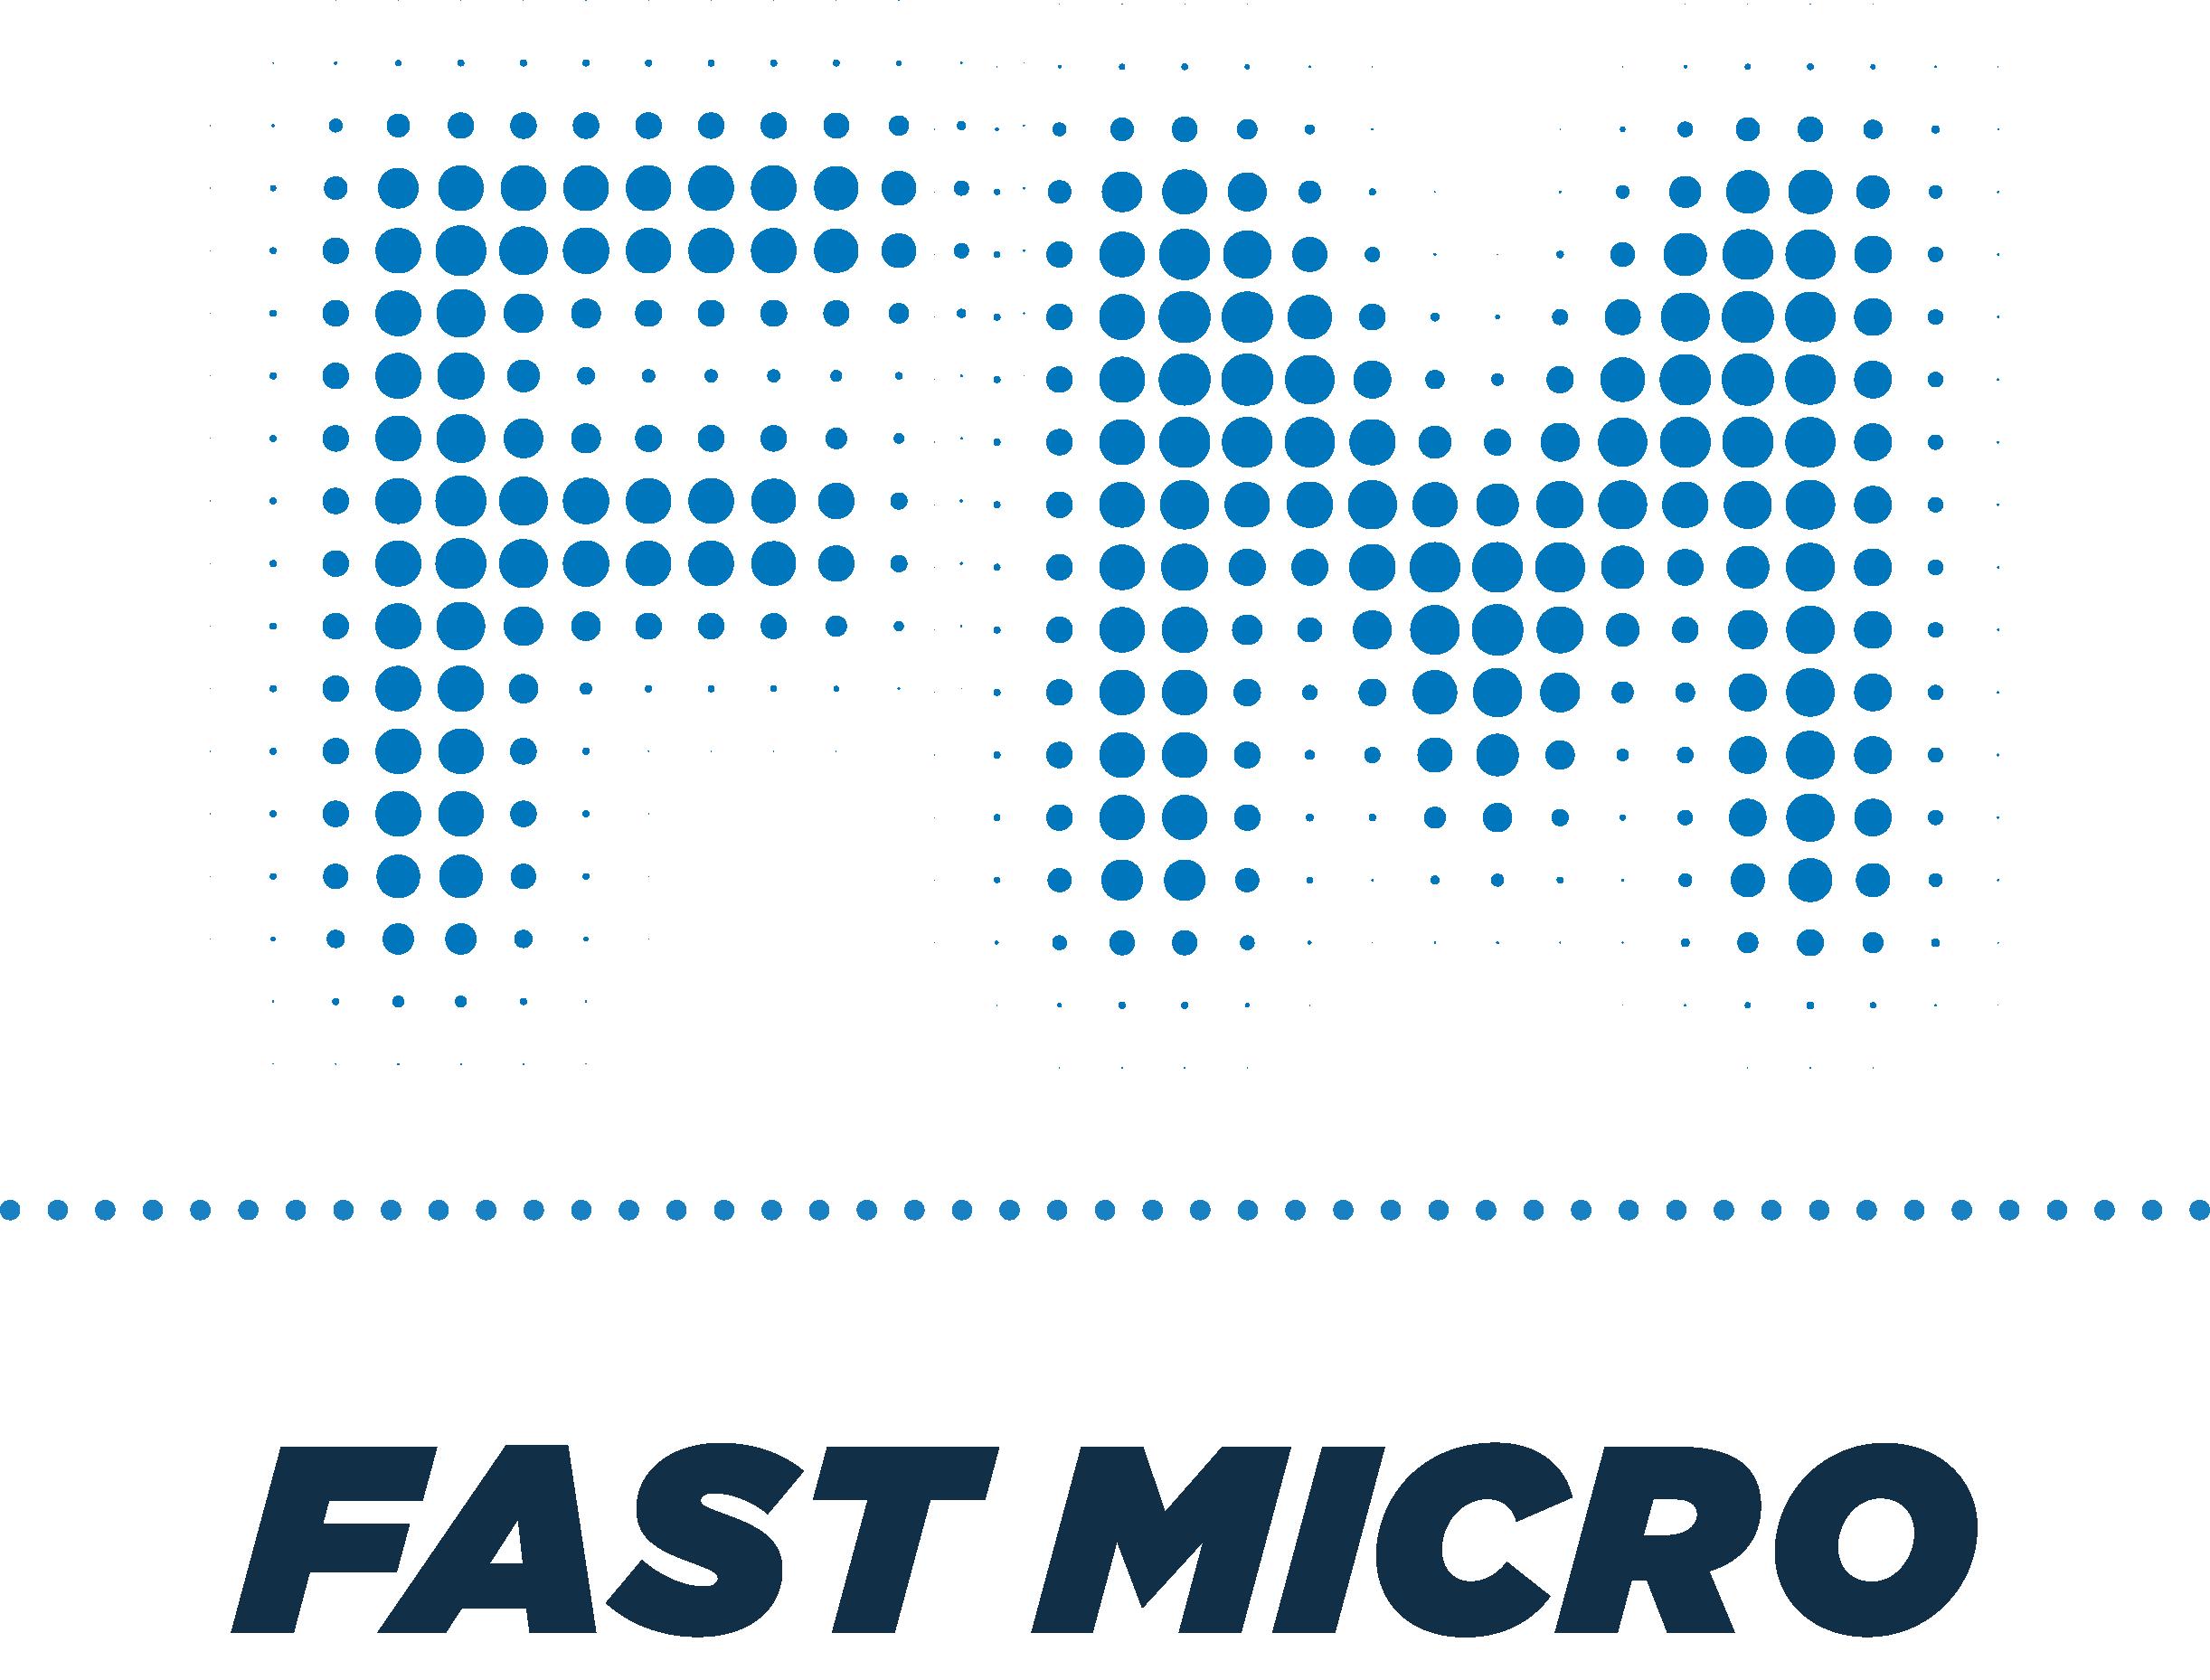 FastMicro